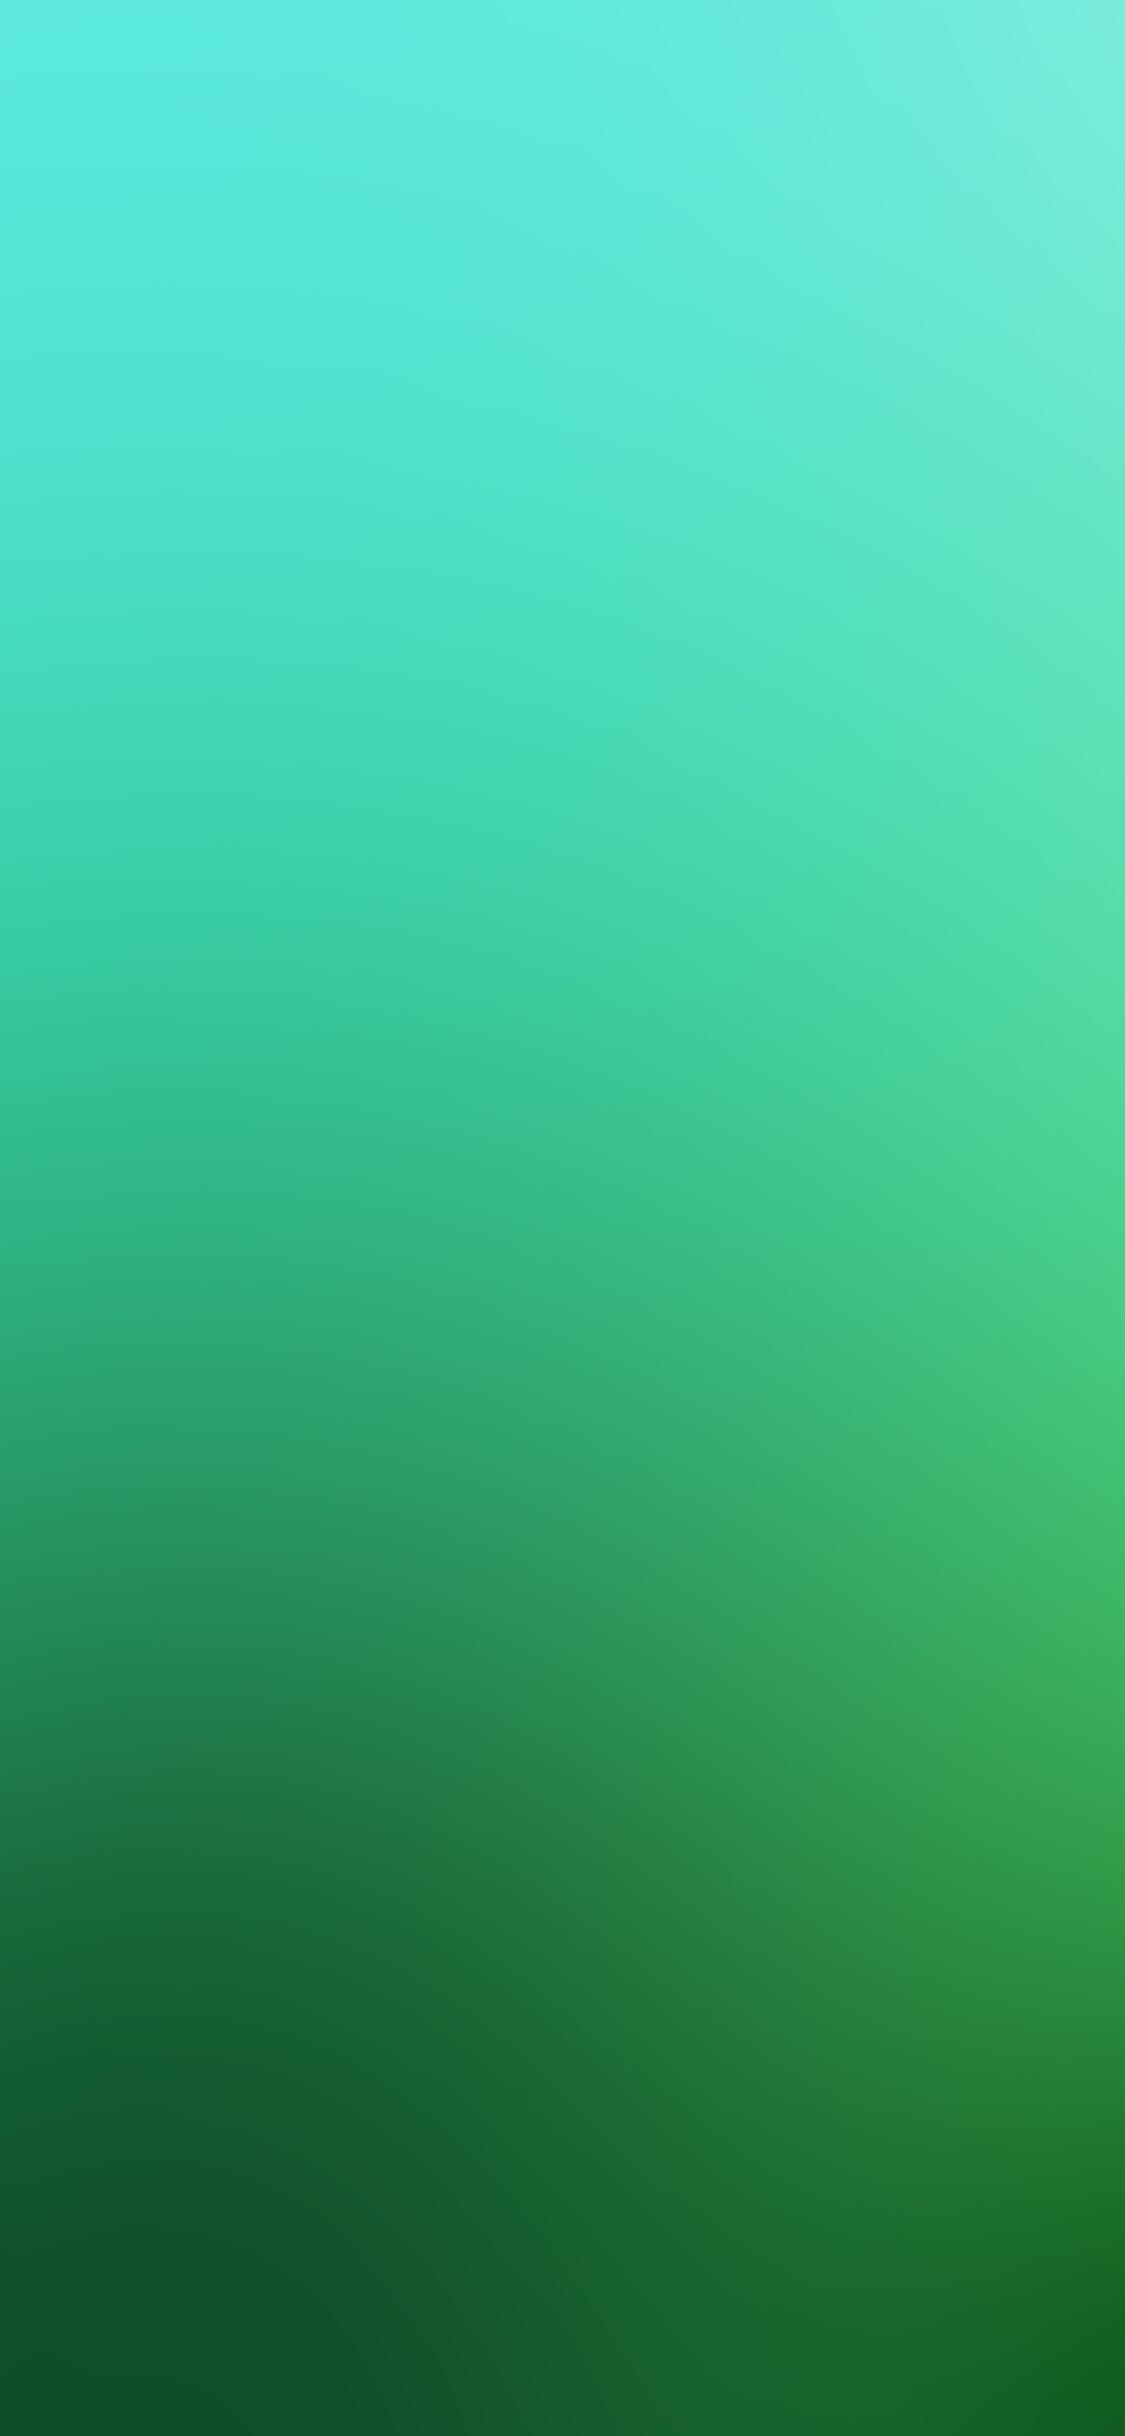 iPhoneXpapers.com-Apple-iPhone-wallpaper-sf79-green-love-gay-gradation-blur